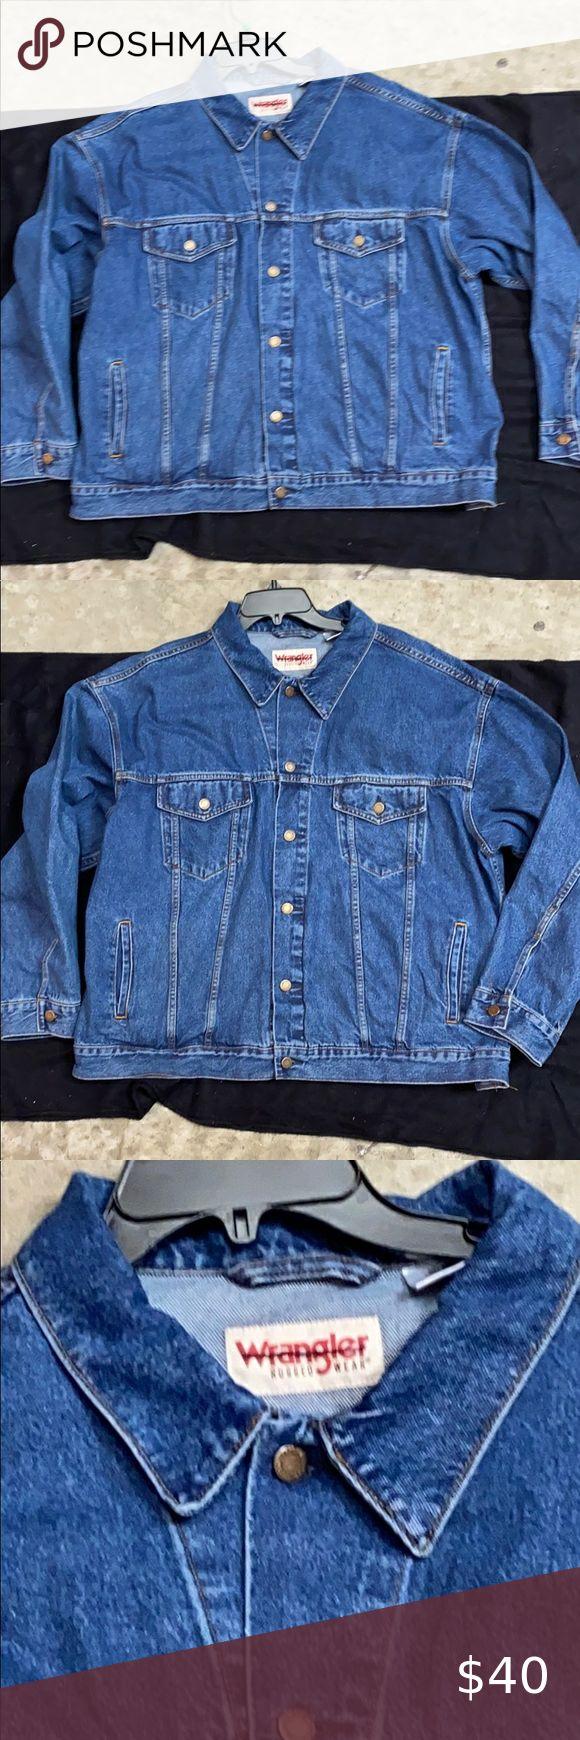 5xl Wrangler Denim Jean Jacket New No Tag 5xl Wrangler Denim Jacket New No Tag Wrangler Vintage Wrangler Jeans Sherpa Lined Denim Jacket Jean Jacket For Girls [ 1740 x 580 Pixel ]